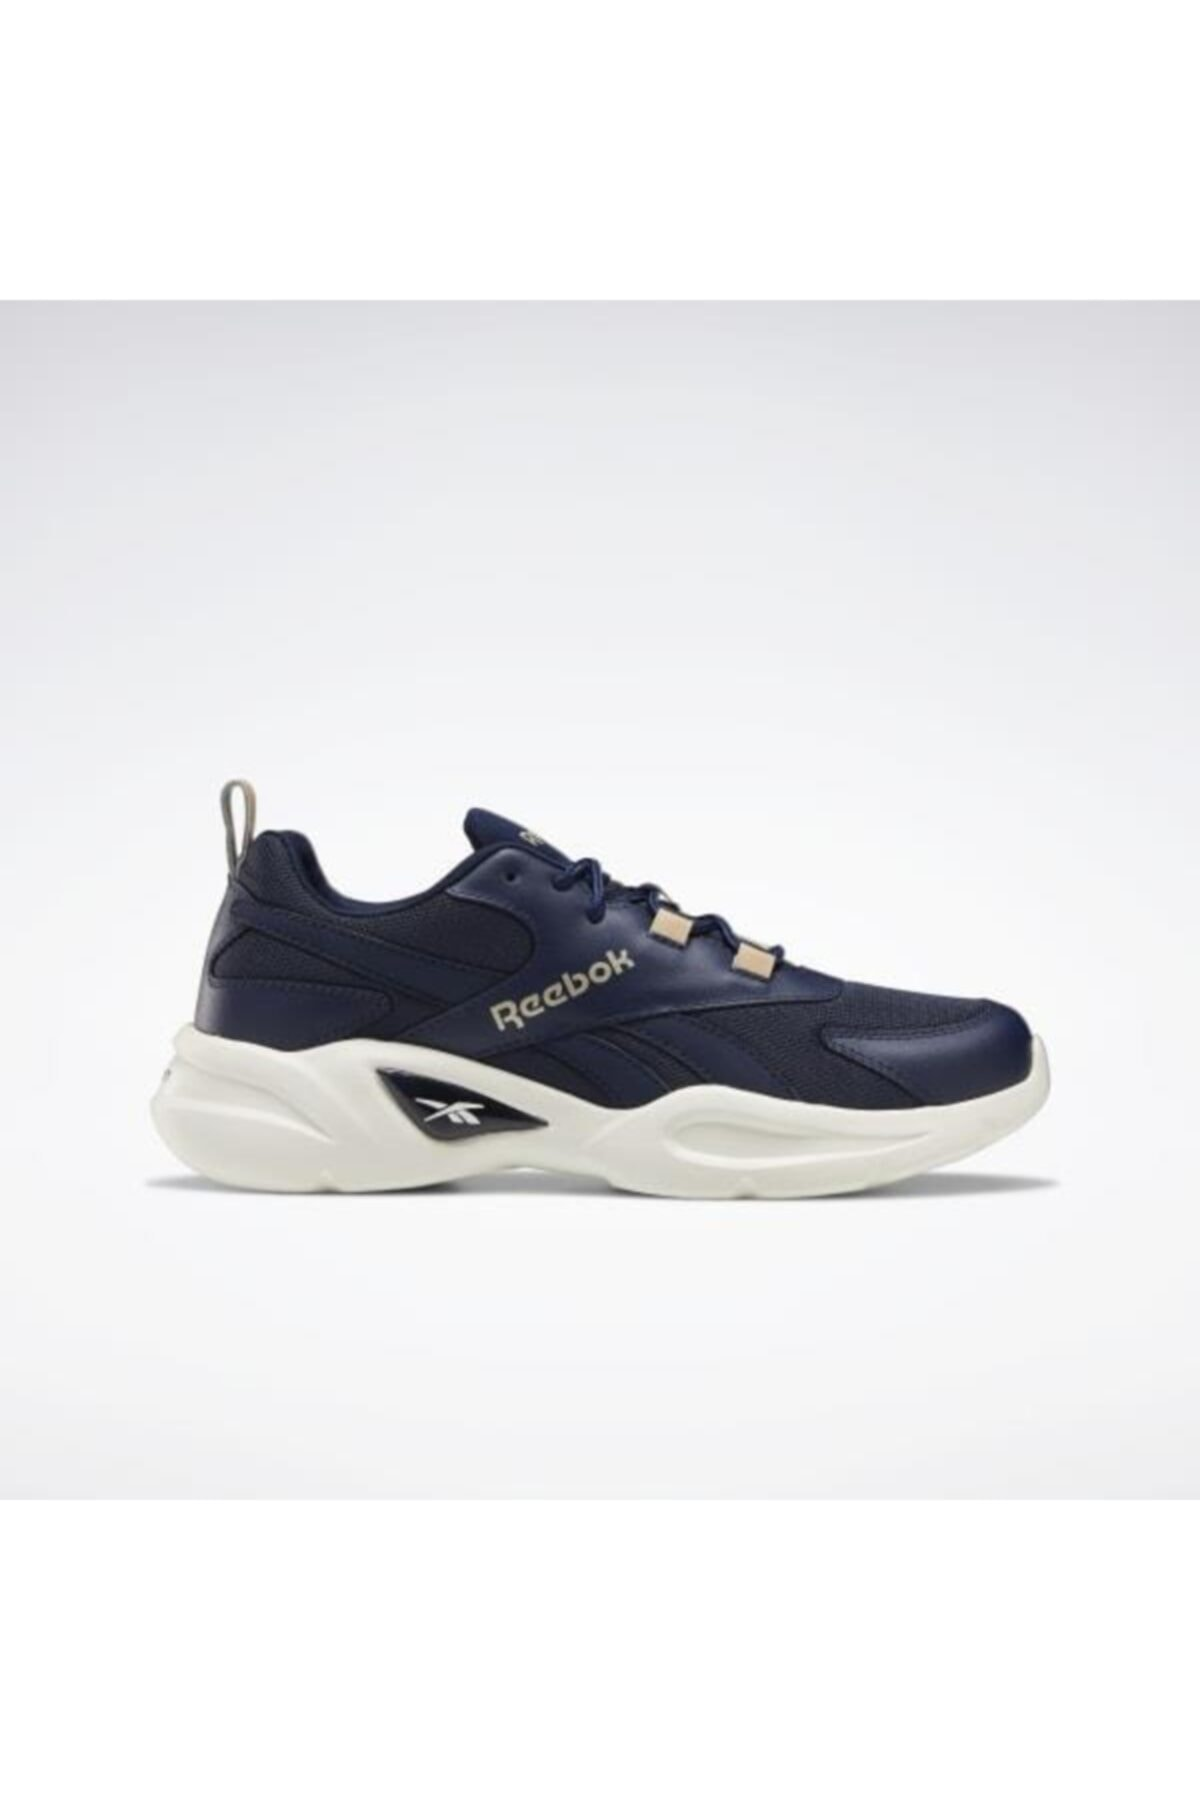 Reebok ROYAL EC RIDE 4 Lacivert Erkek Sneaker Ayakkabı 100664871 1